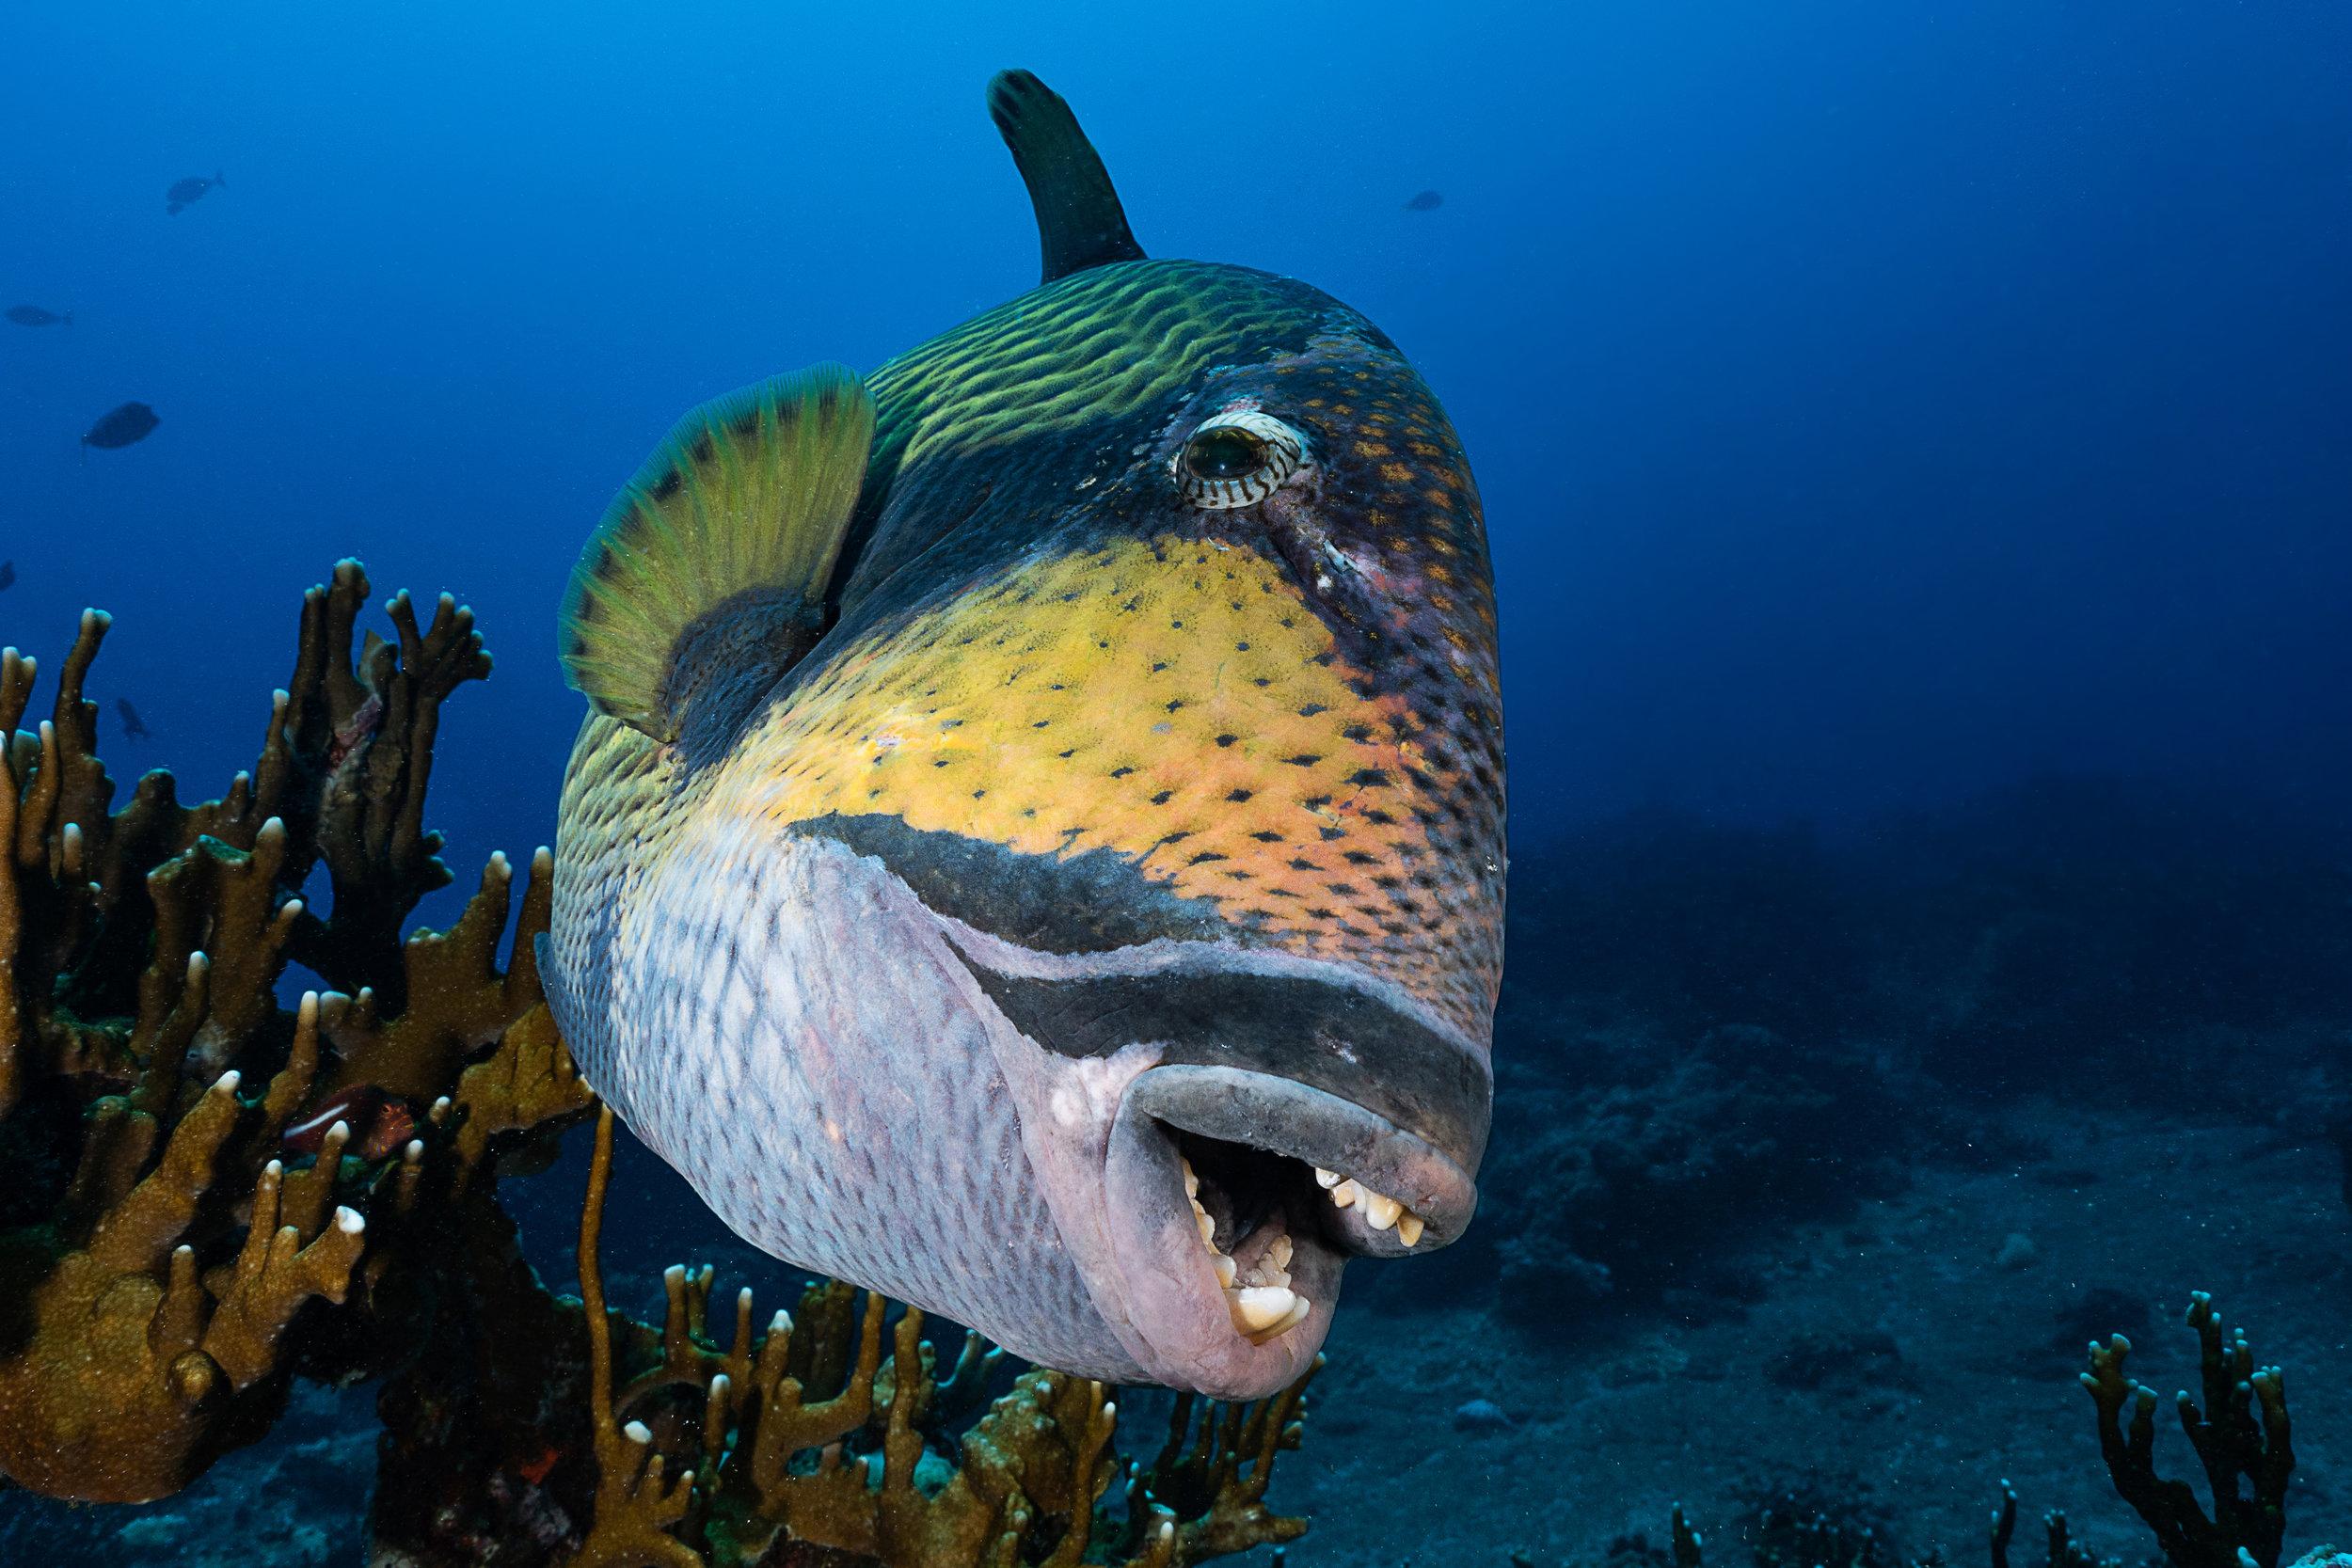 triggerfish credit: François Baelen / coral reef image bank